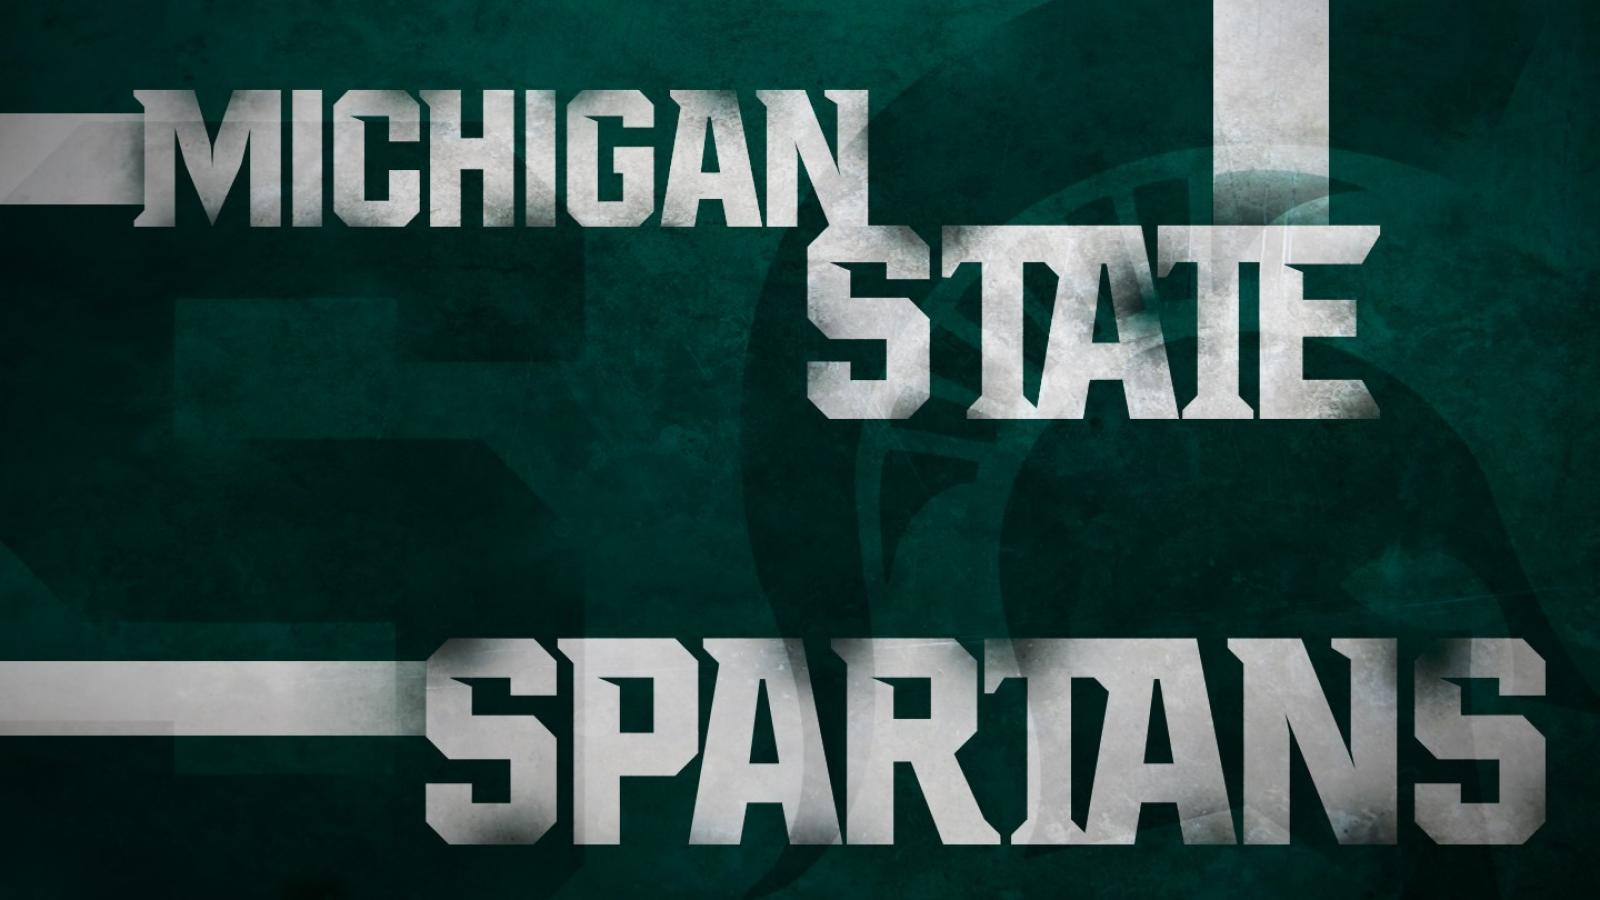 Michigan state spartans wallpaper 62795 1600x900